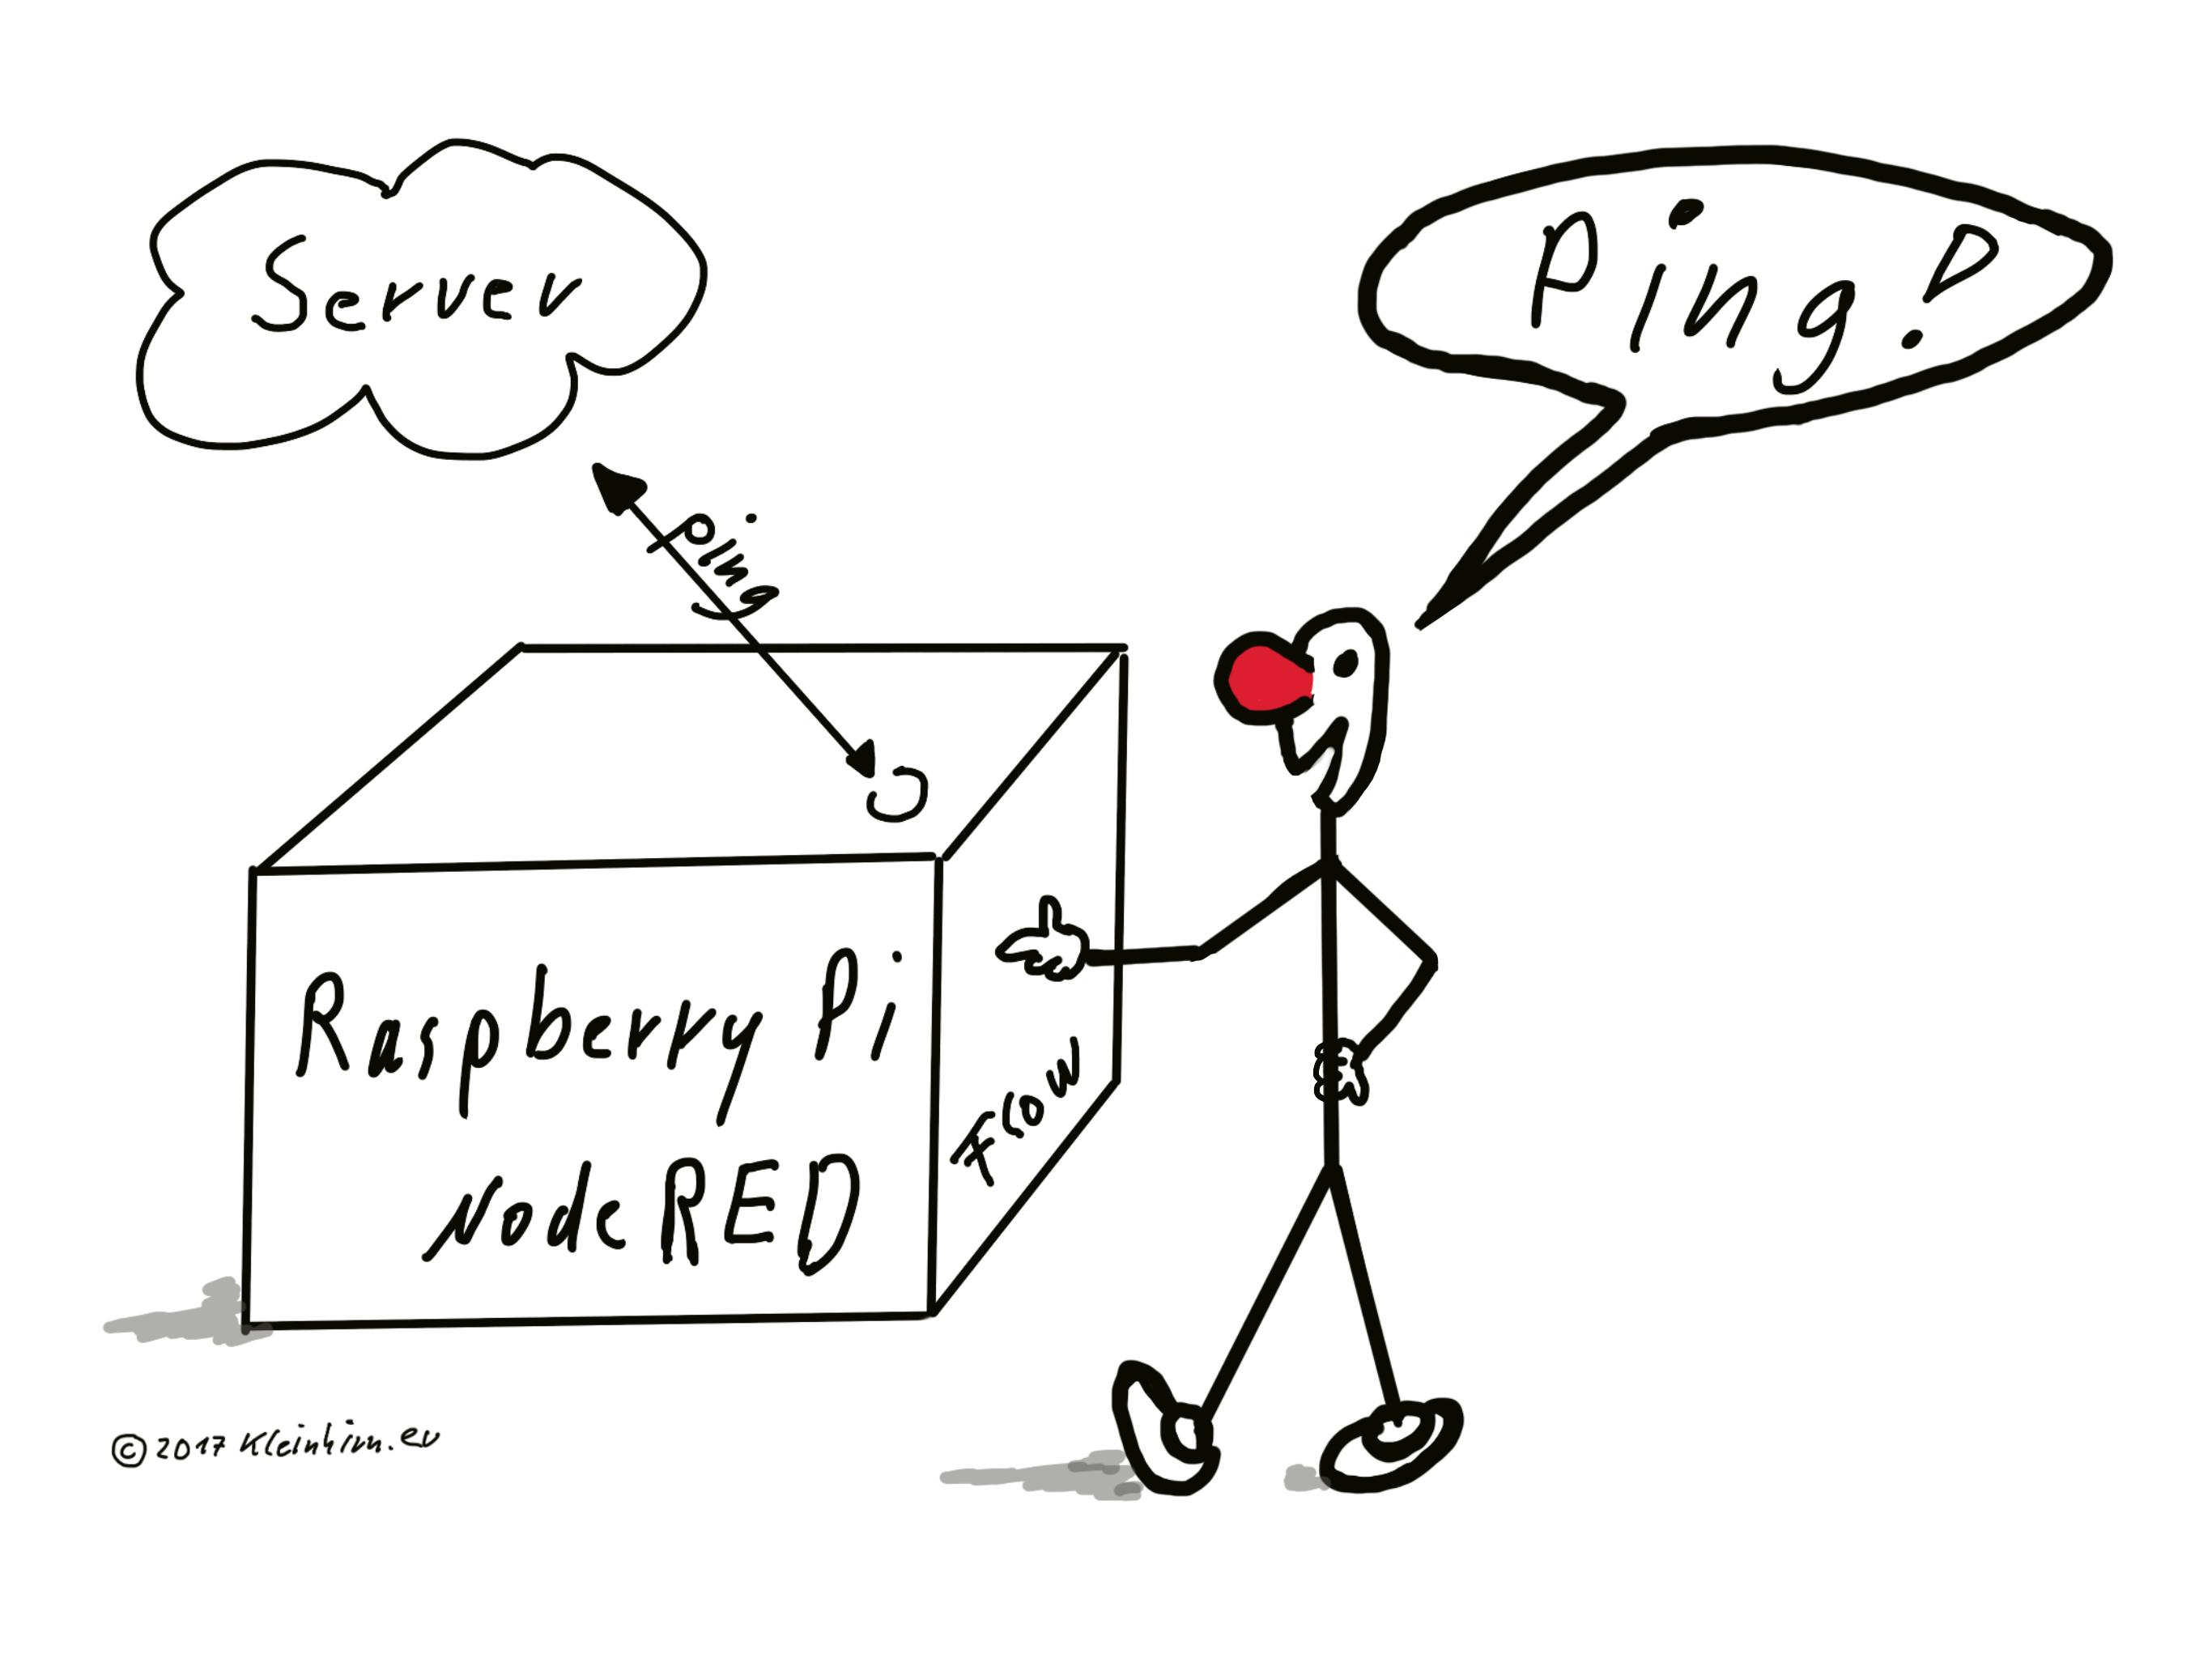 u00dcberwachung  automatischer ping an server mit nodered auf raspberry pi   u0645 u0631 u0627 u0642 u0628 u0629   u2013 wenzlaff de